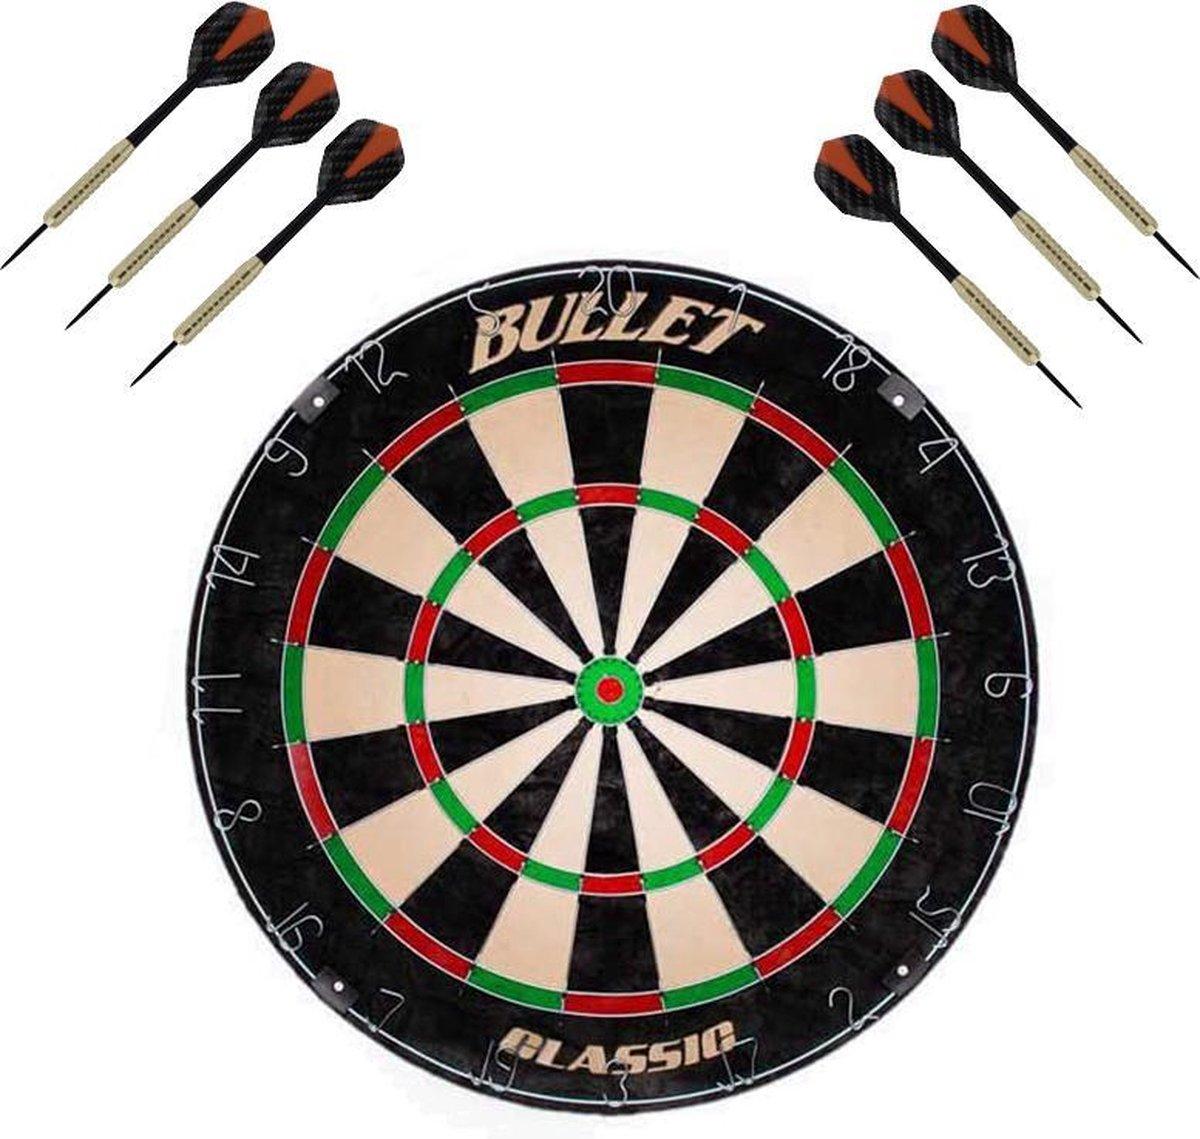 Dragon Darts Bullet Classic - dartbord - inclusief 2 sets - dartpijlen